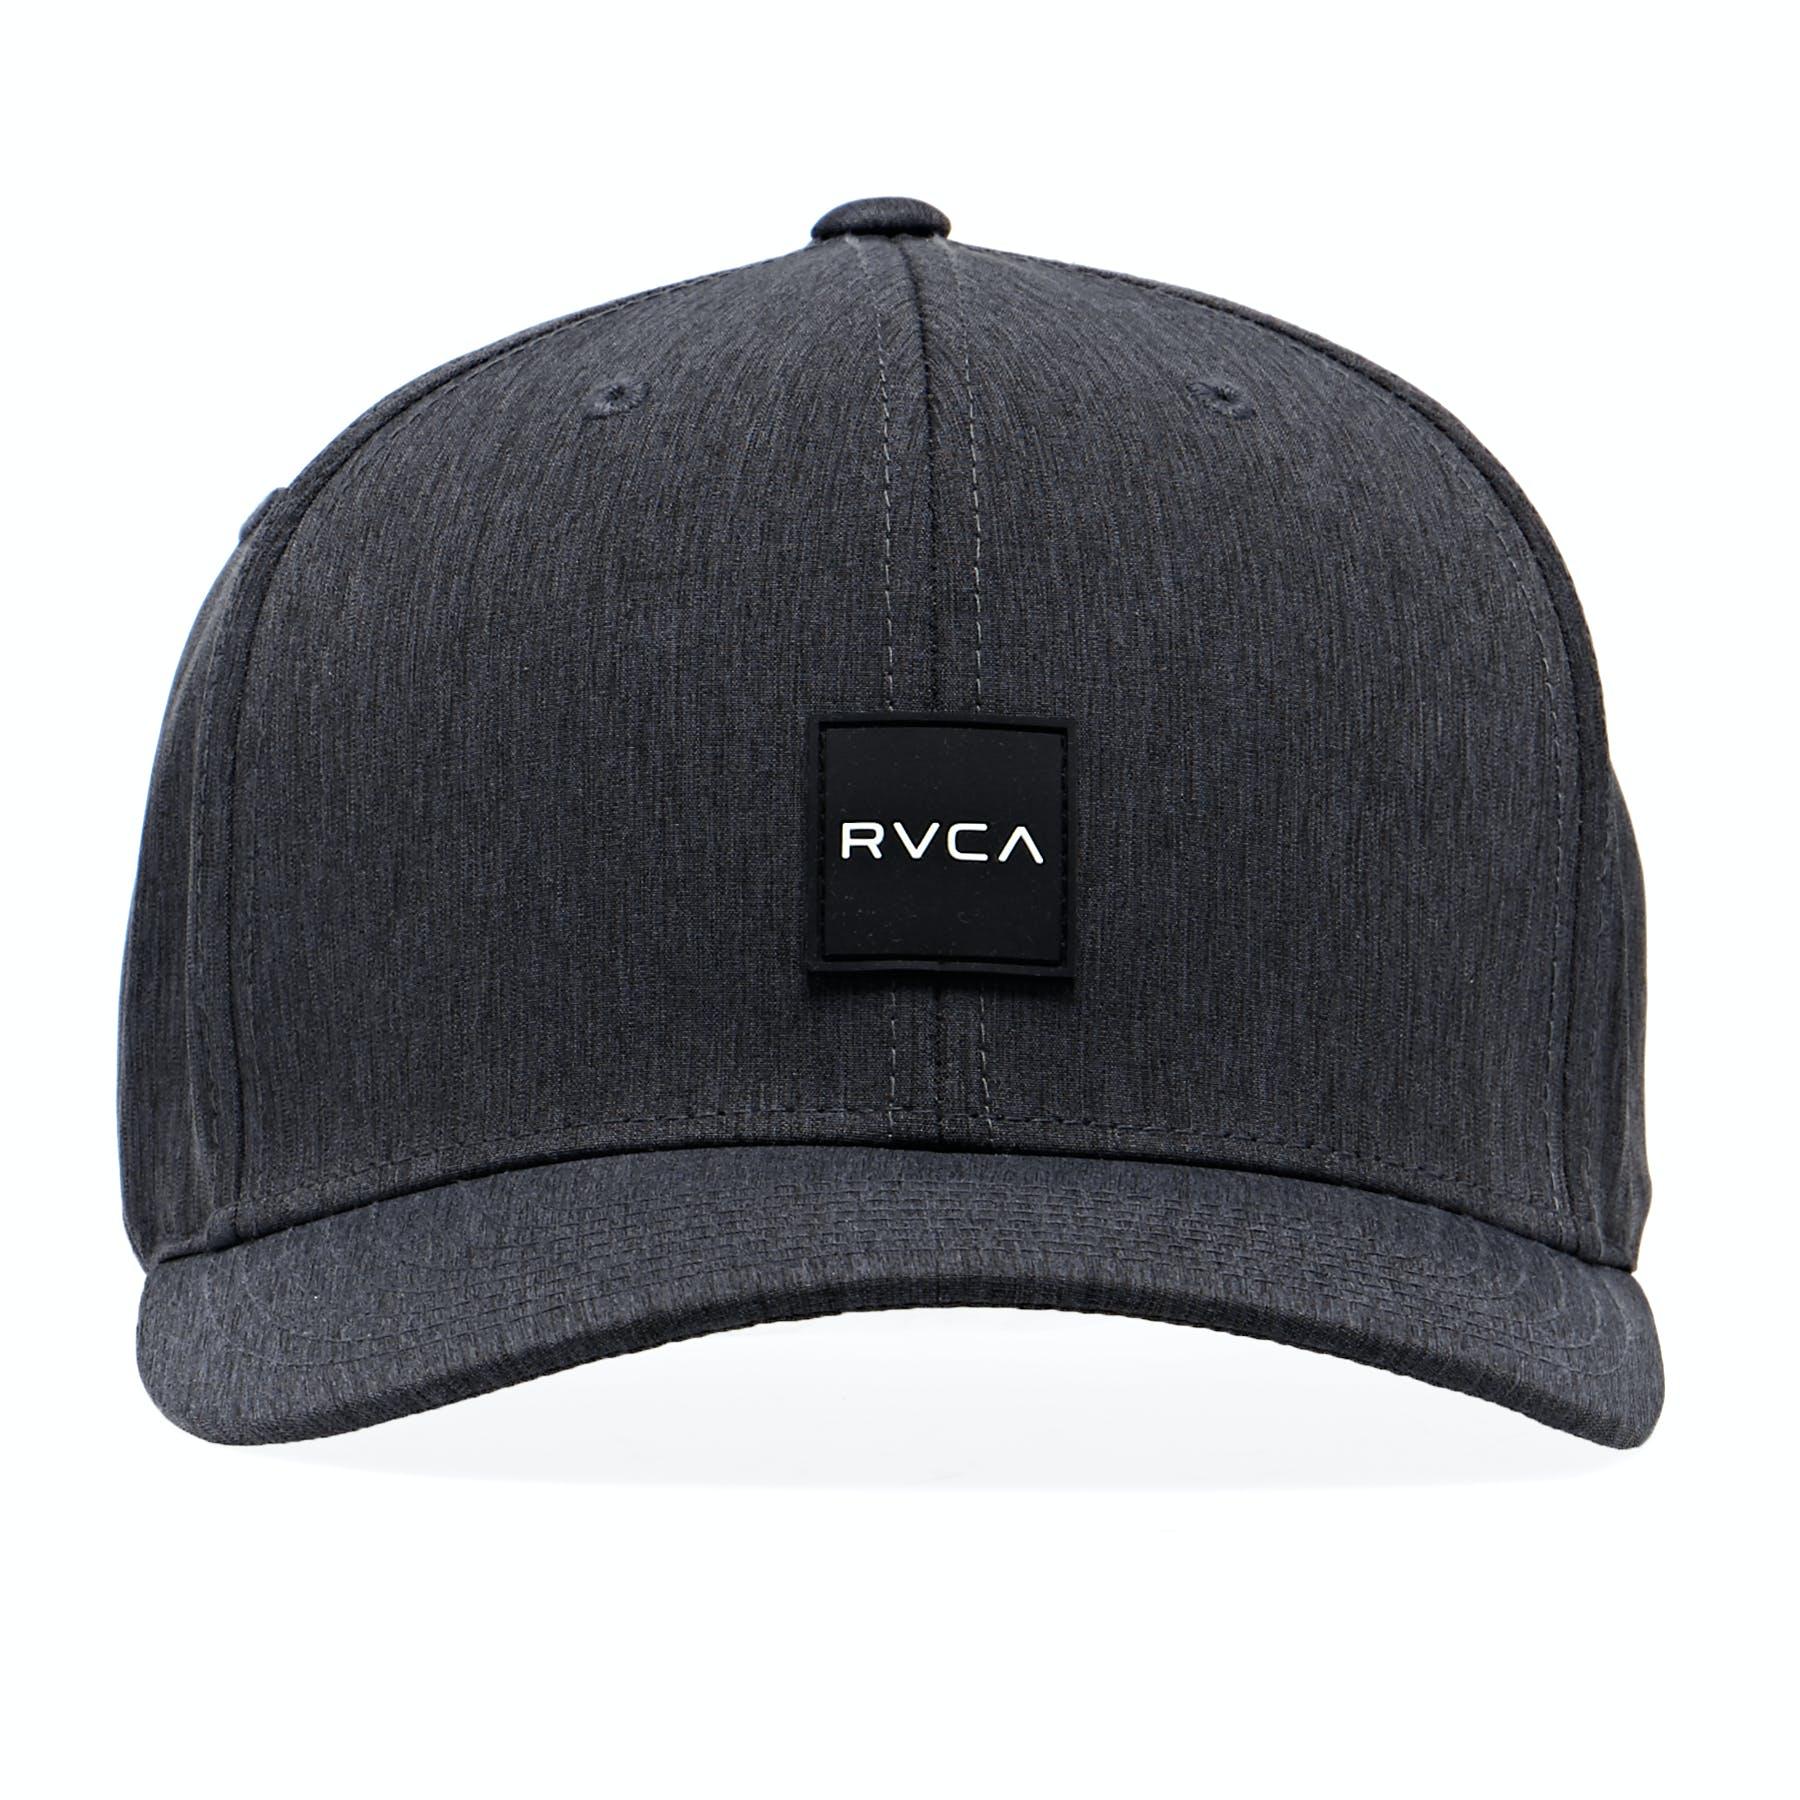 RVCA Shift Flexfit Hat